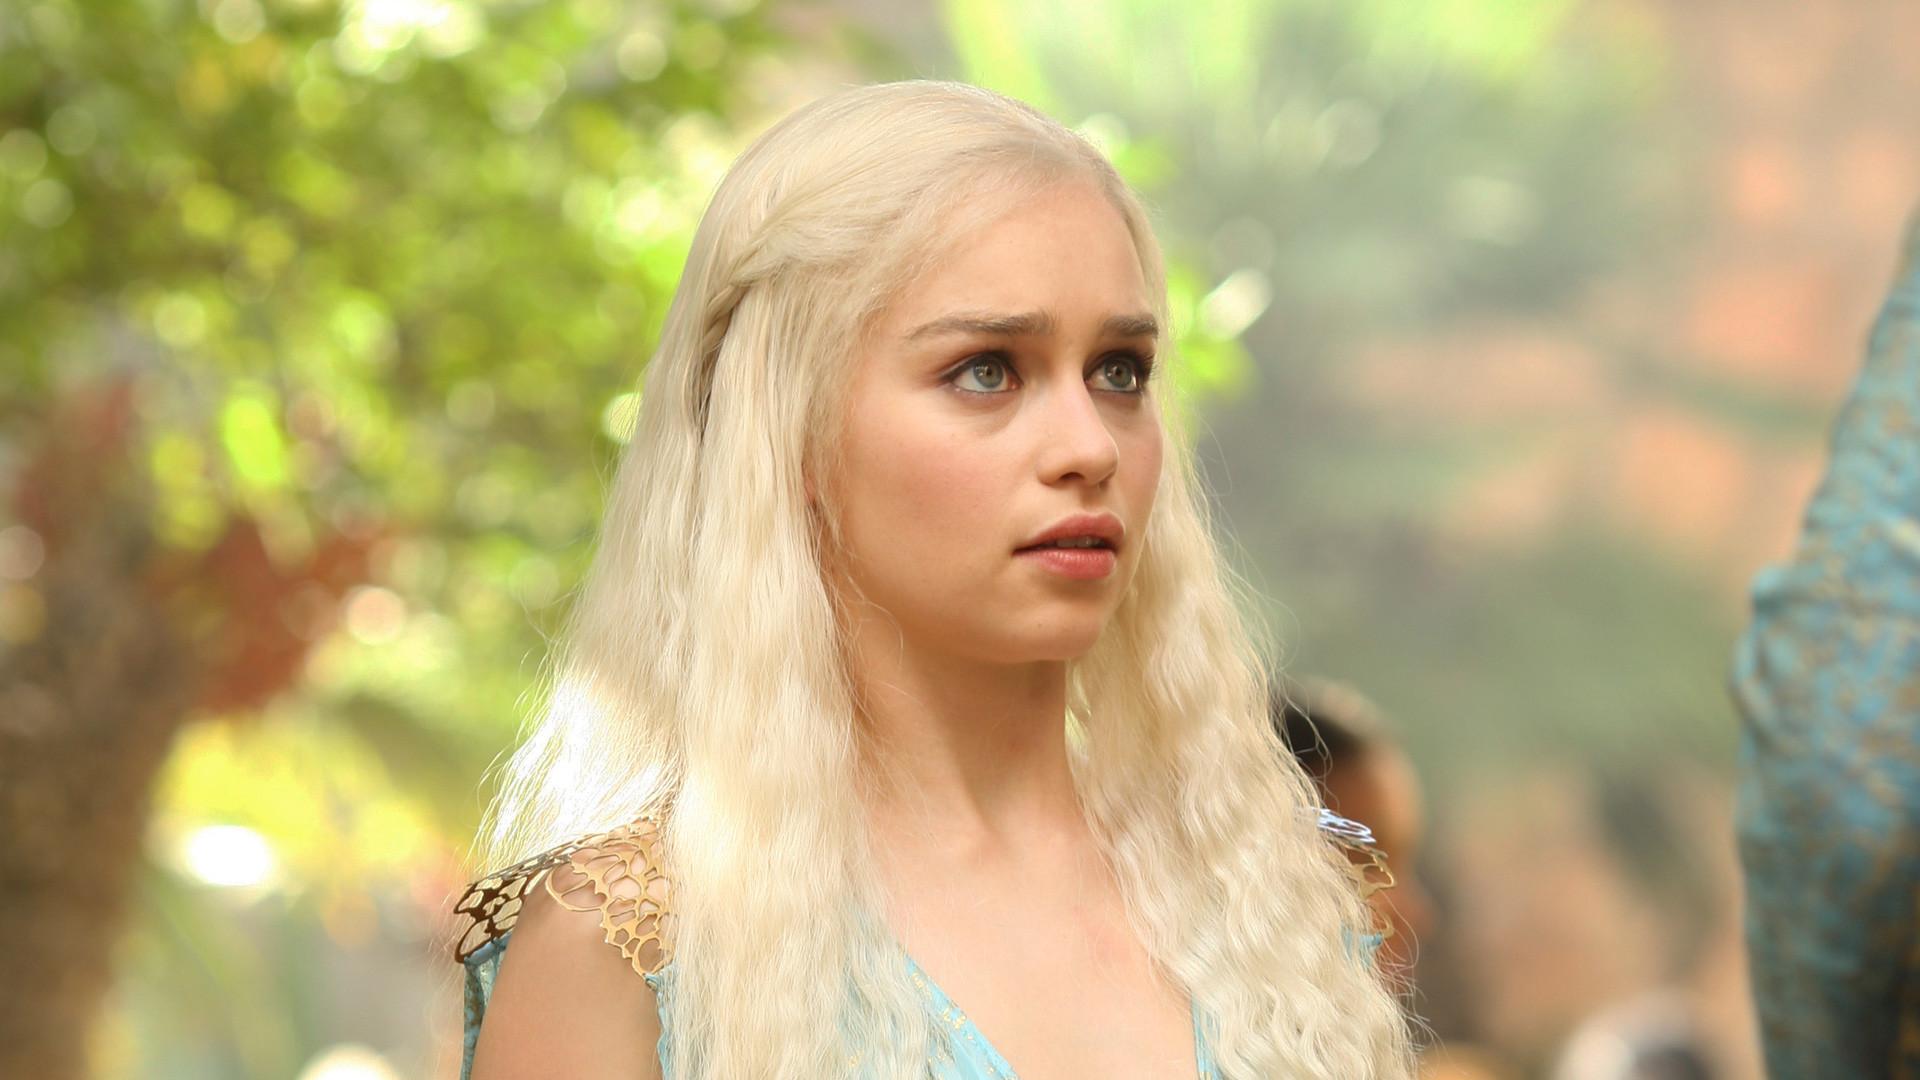 Khaleesi Game of Thrones HD Wallpaper Â« Destkop BackgroundsDestkop  Backgrounds